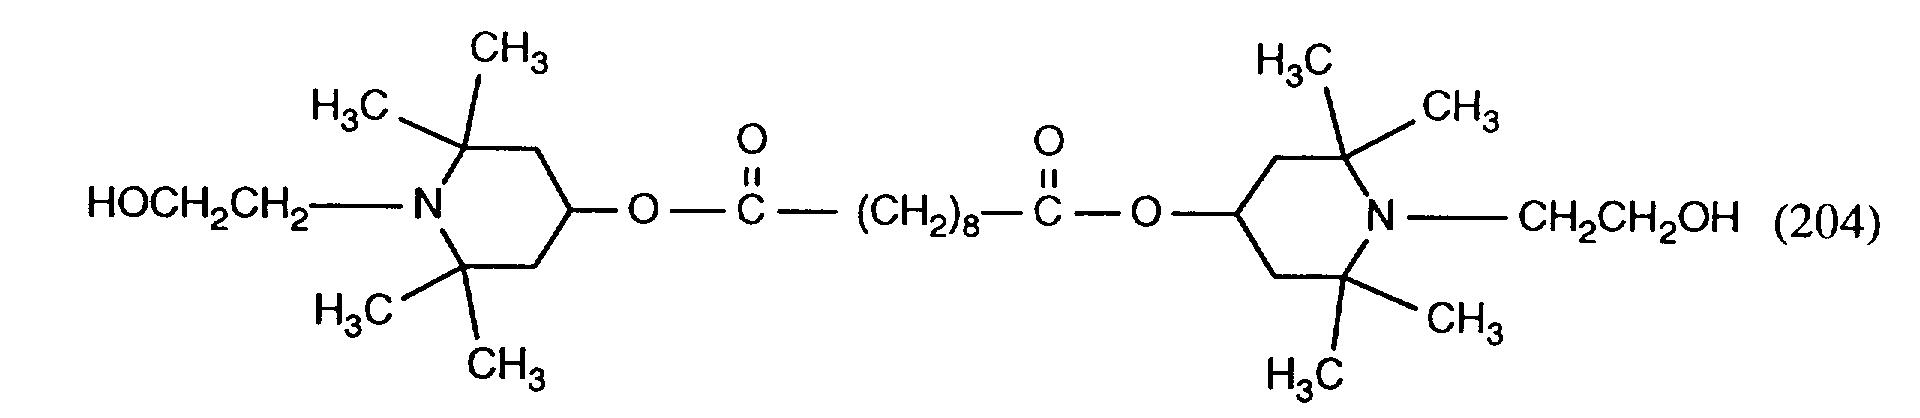 EP0707035A1 - HALS phosphorinanes as stabilisers - Google